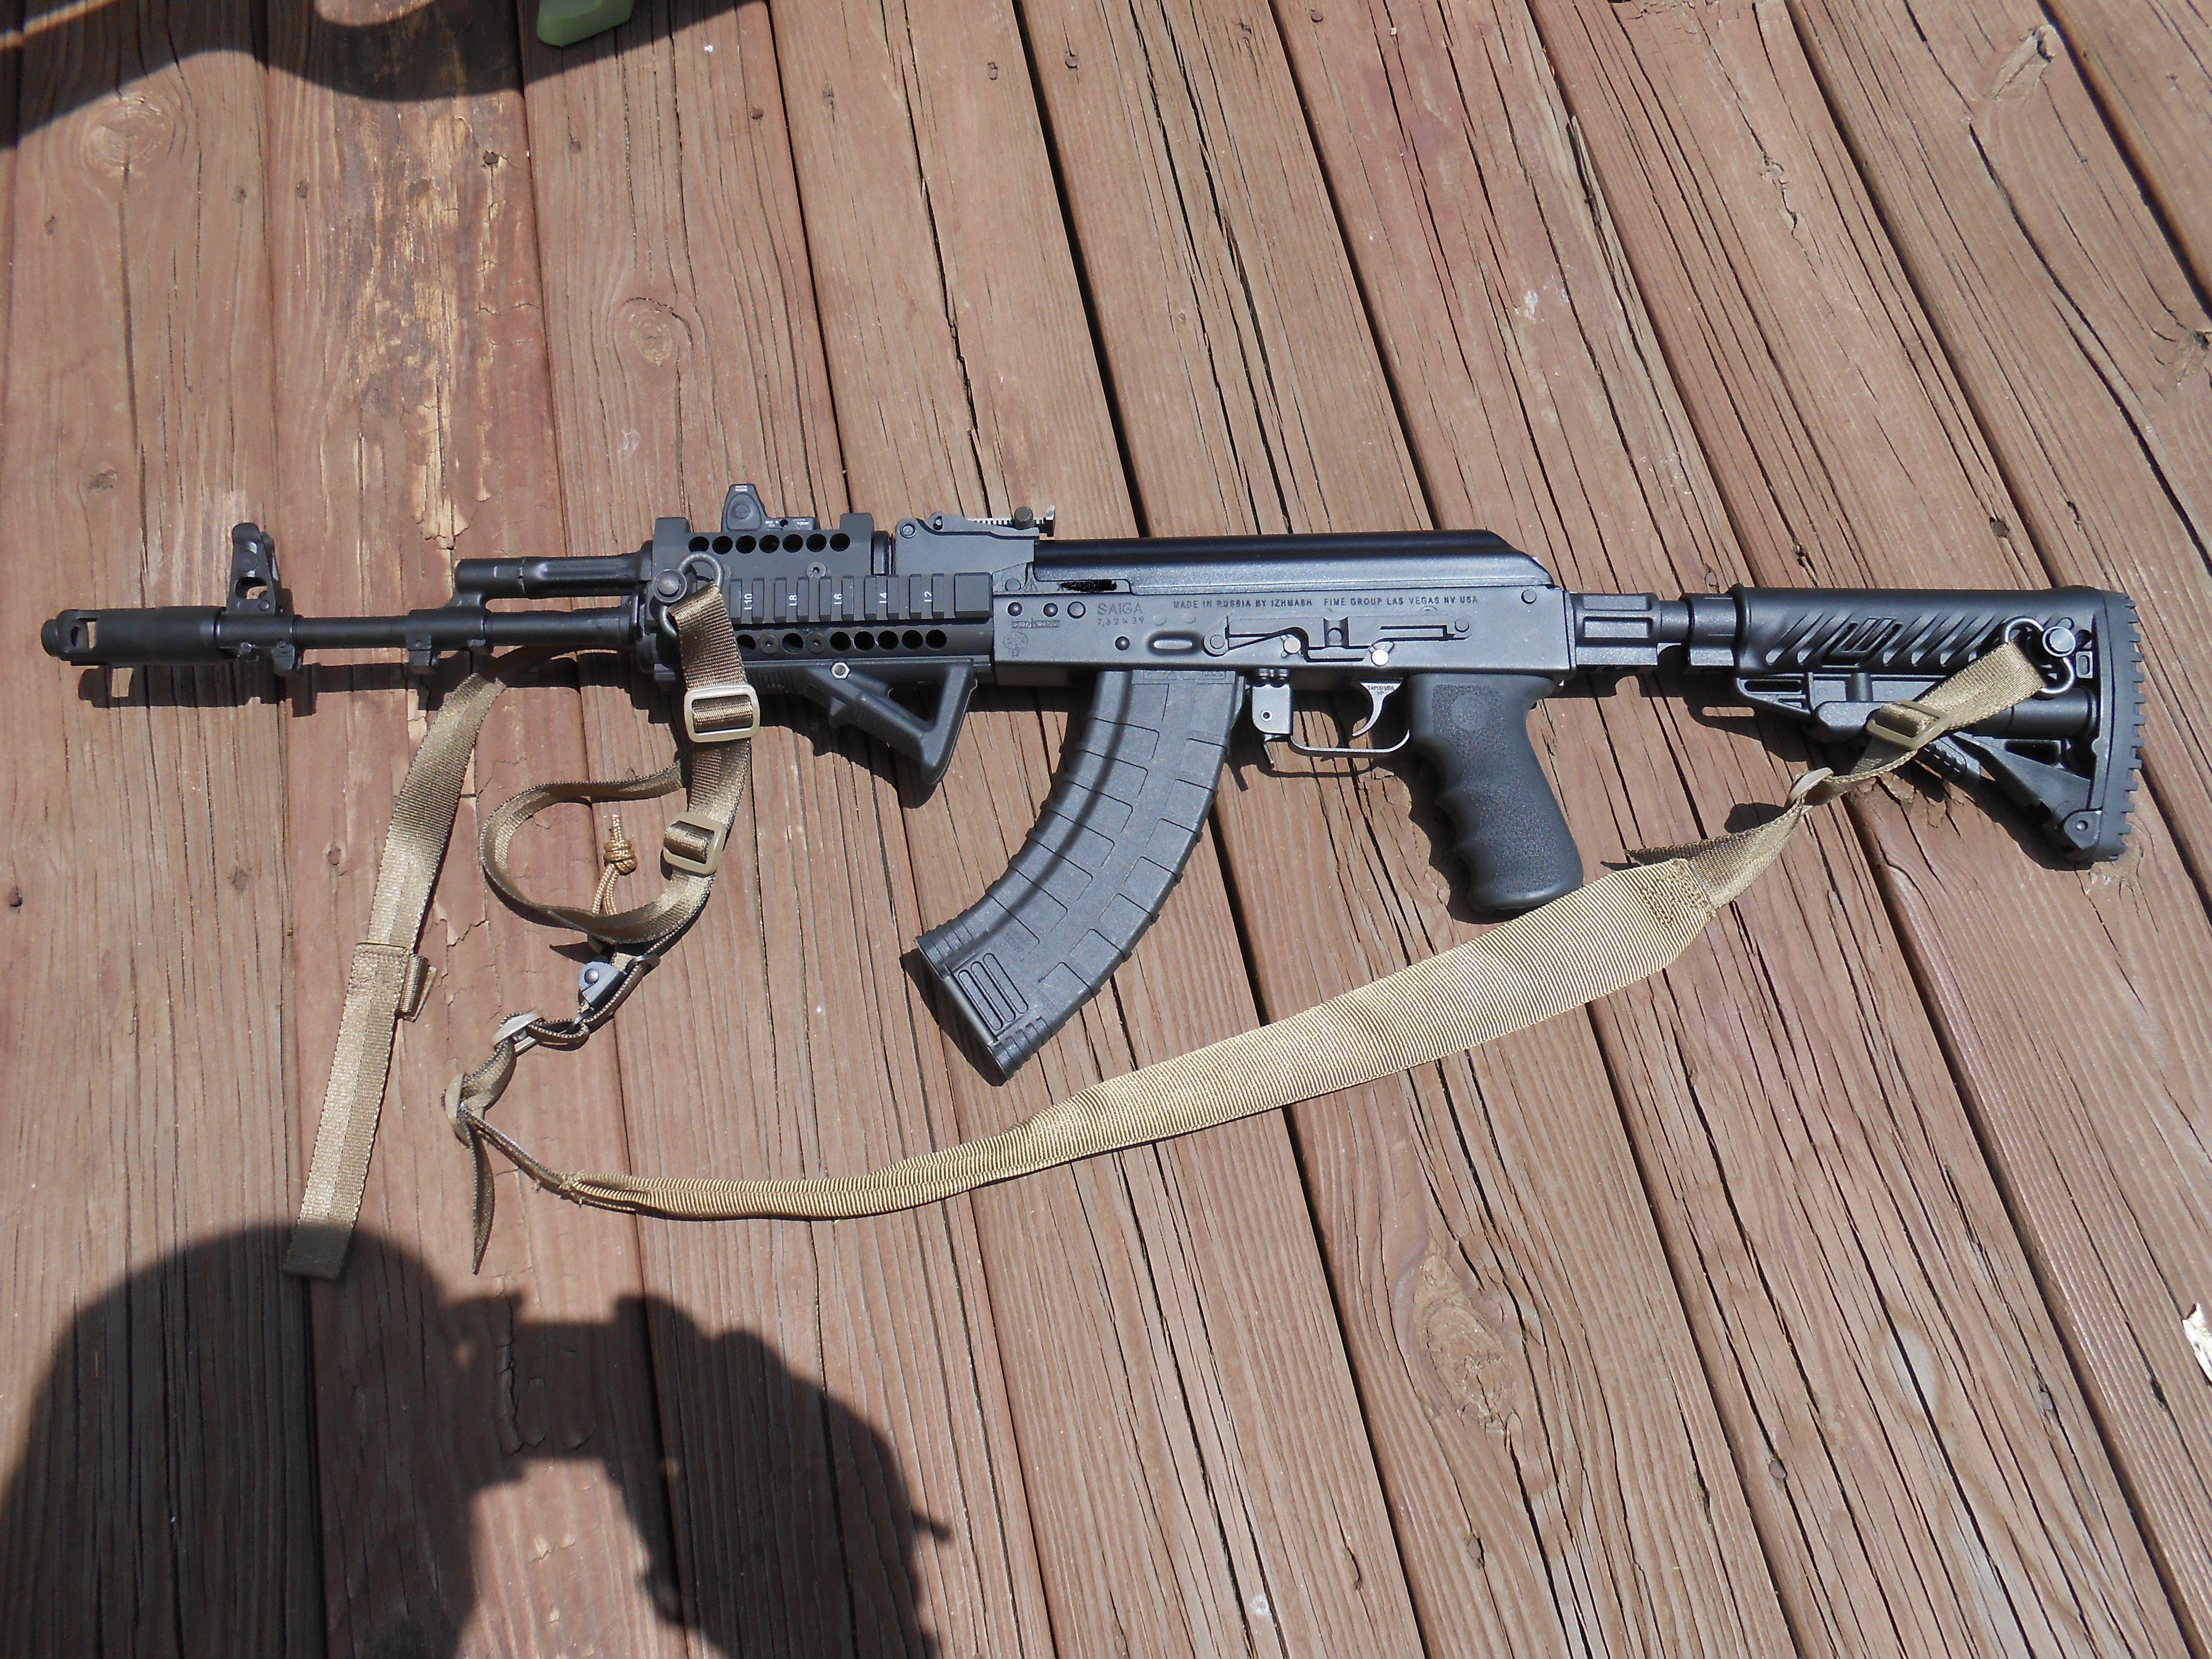 Arsenal/FIME Group SGL-21/AK-103  Mako recoil reducing stock